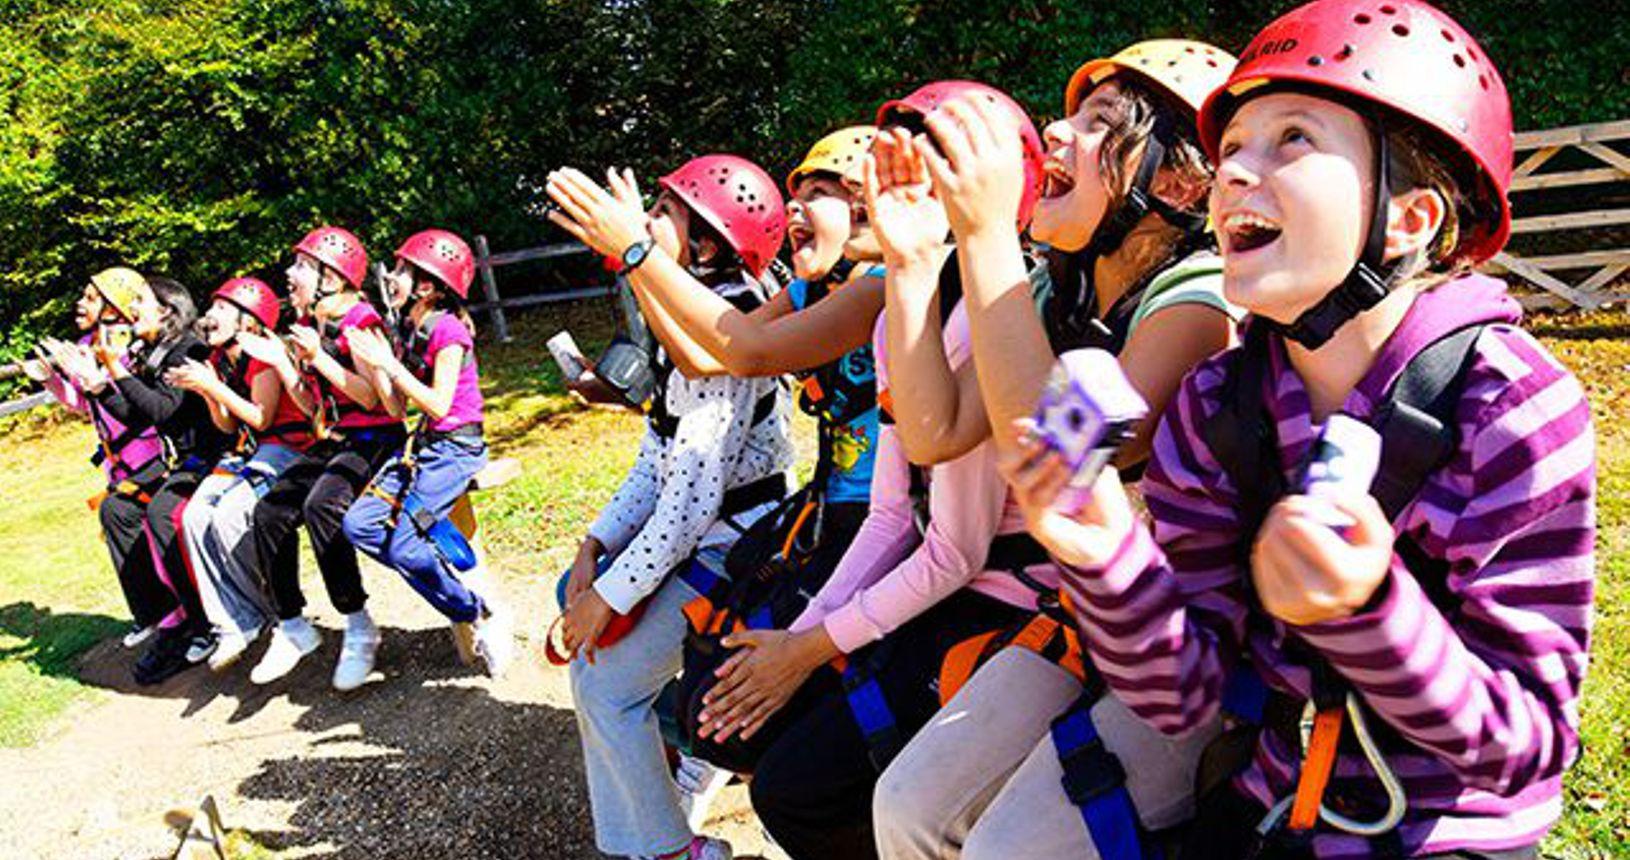 PS-C-Outdoor-climbing-girls-cheering